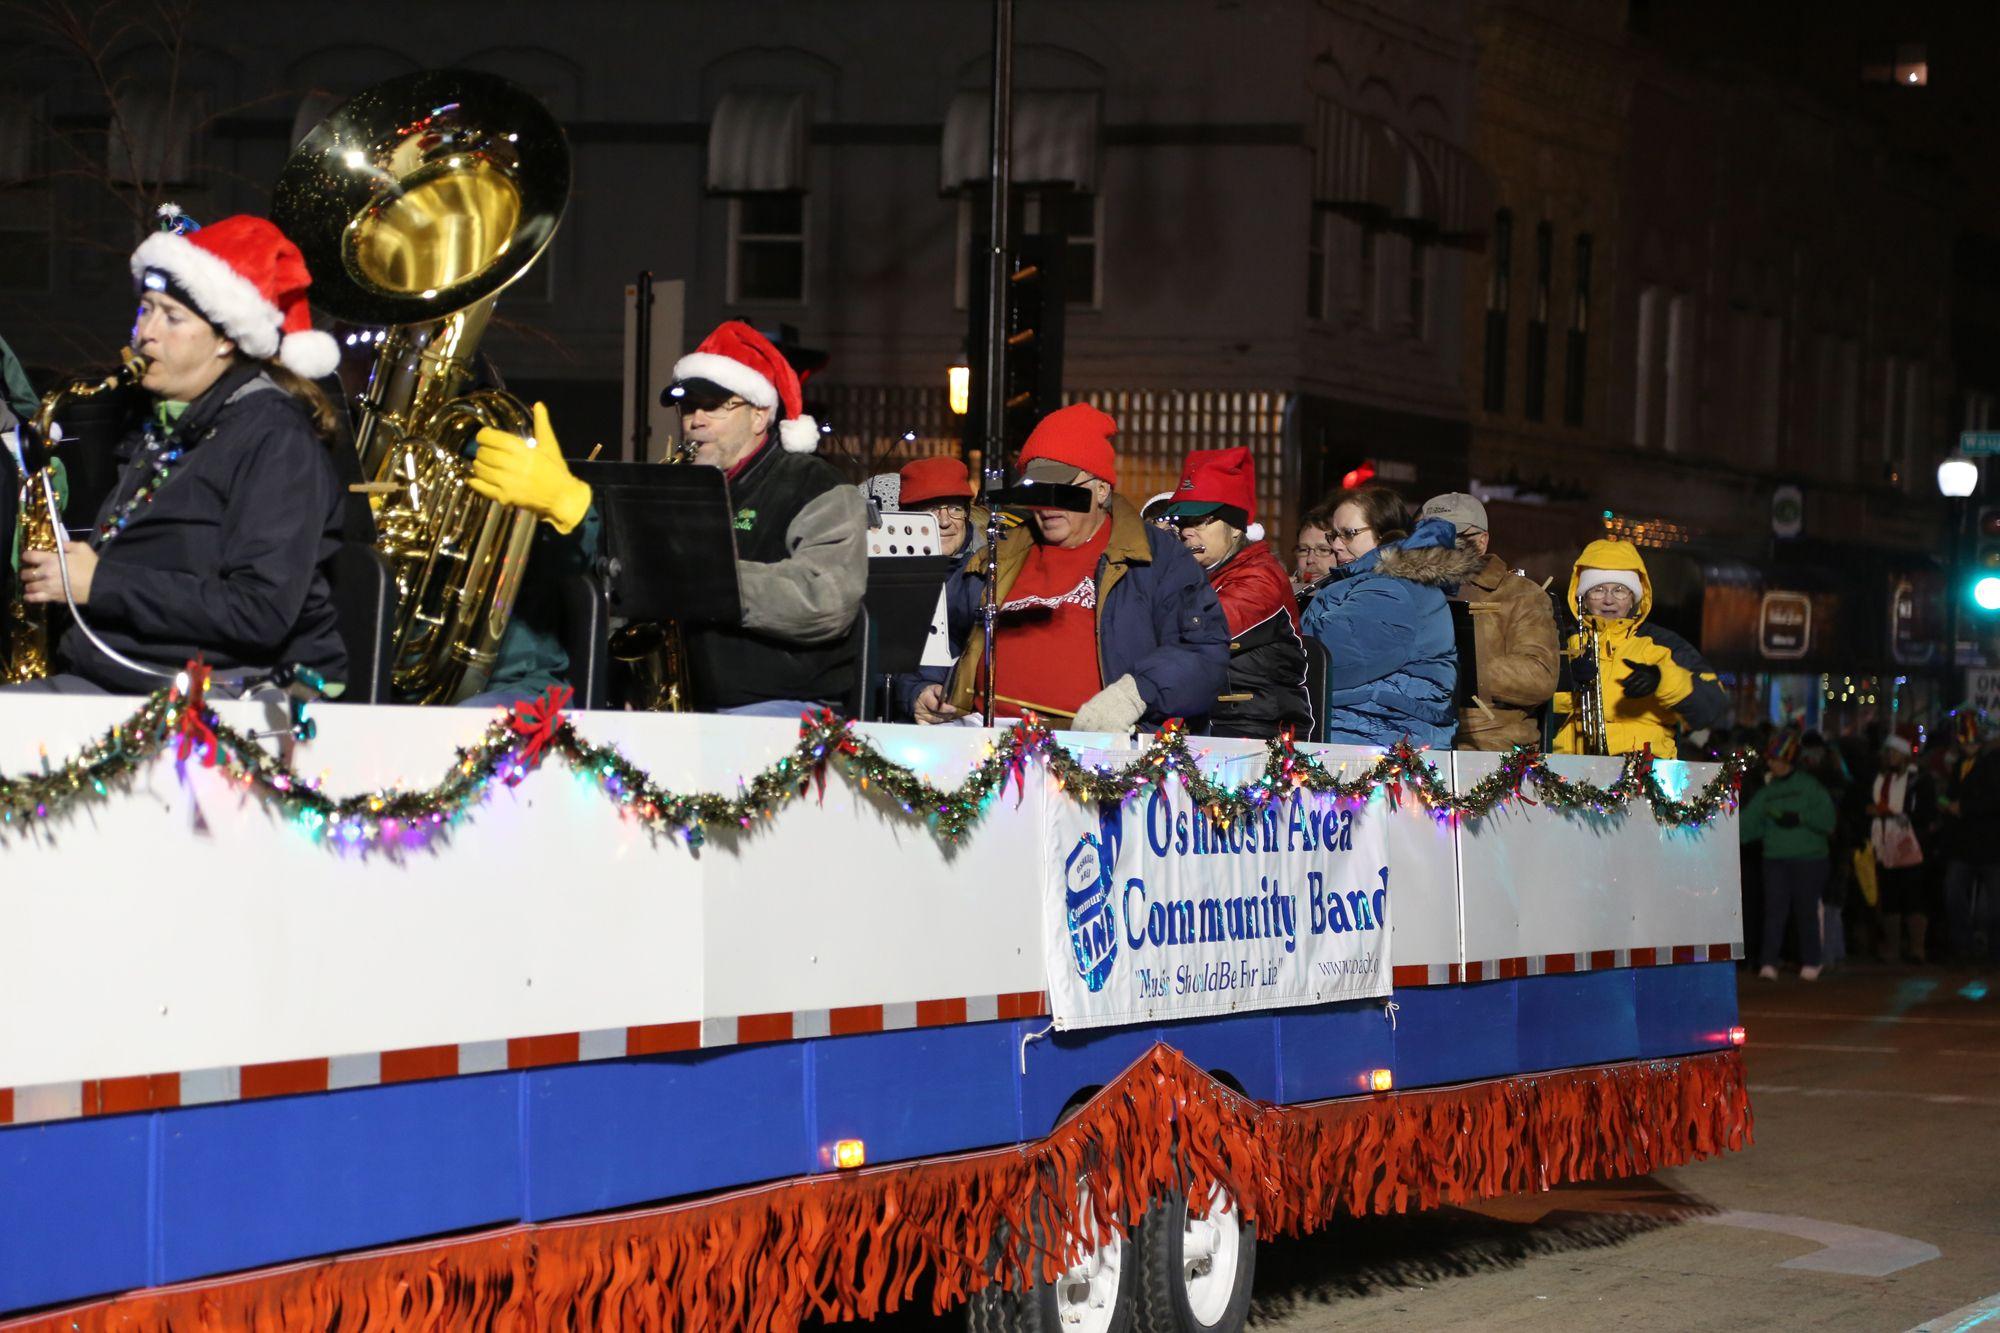 Oshkosh Chamber of Commerce Holiday Parade, November 14